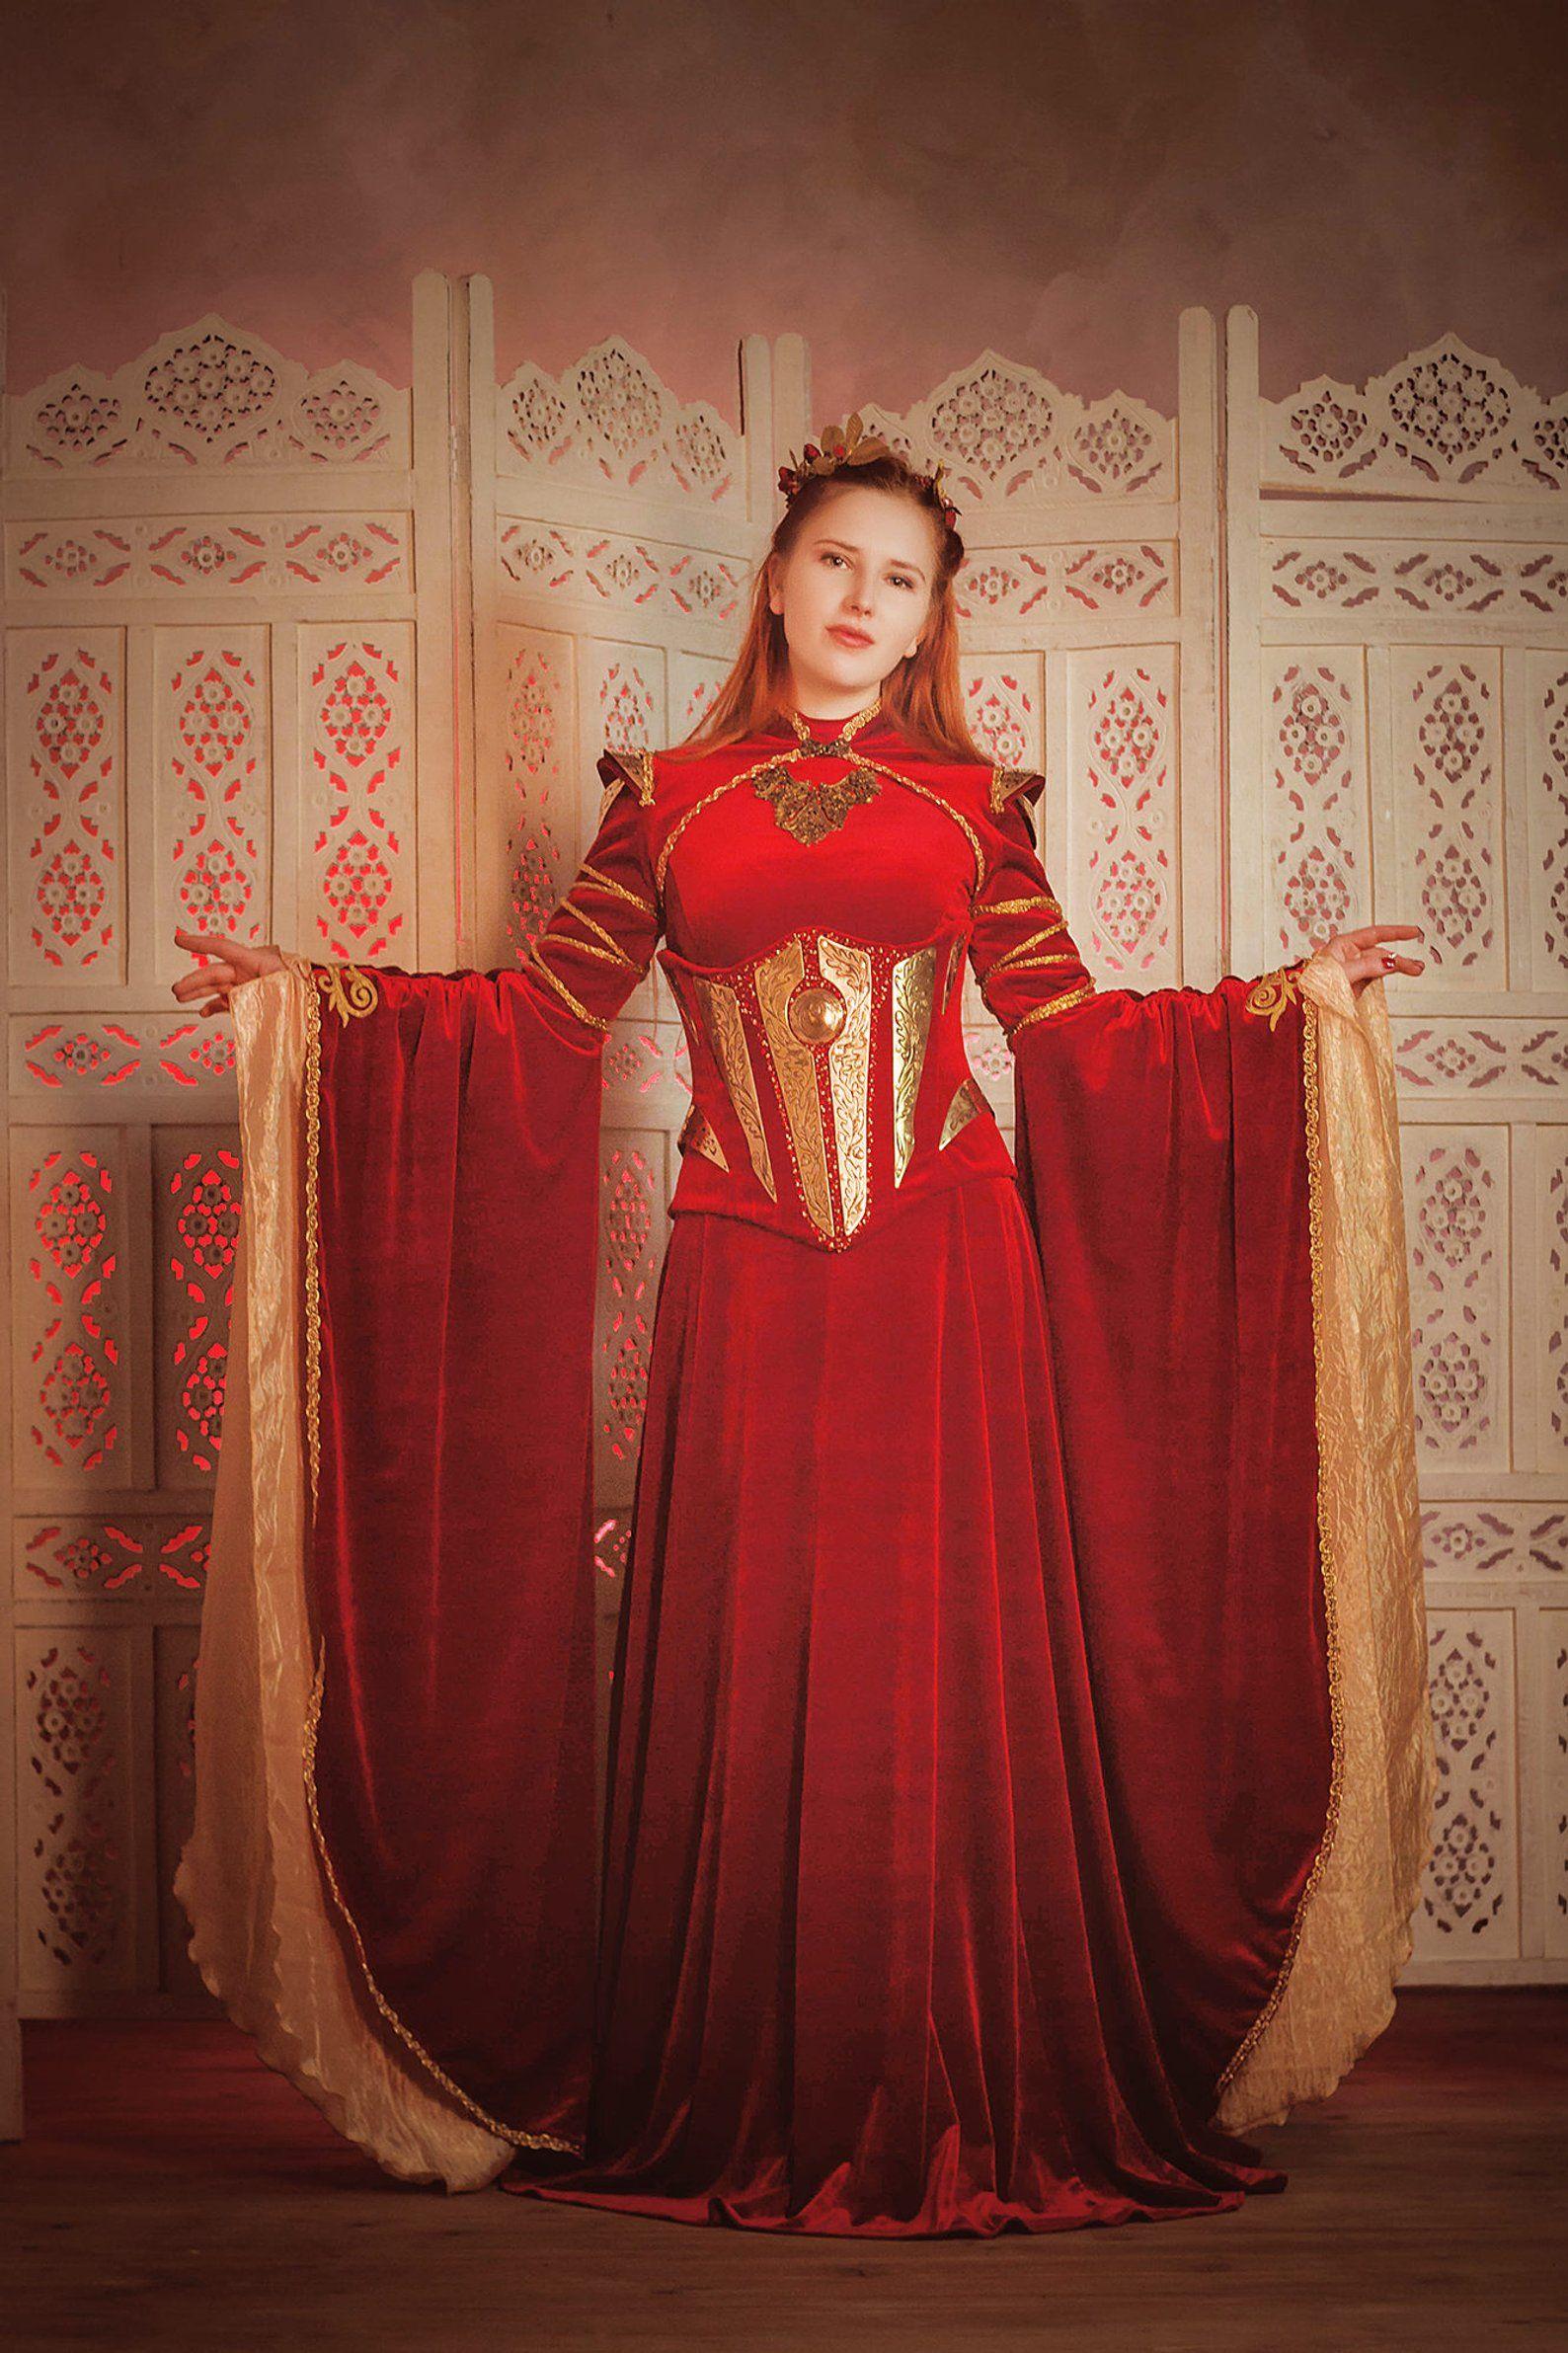 Red velvet elven dress Fantasy gown Corset with metal